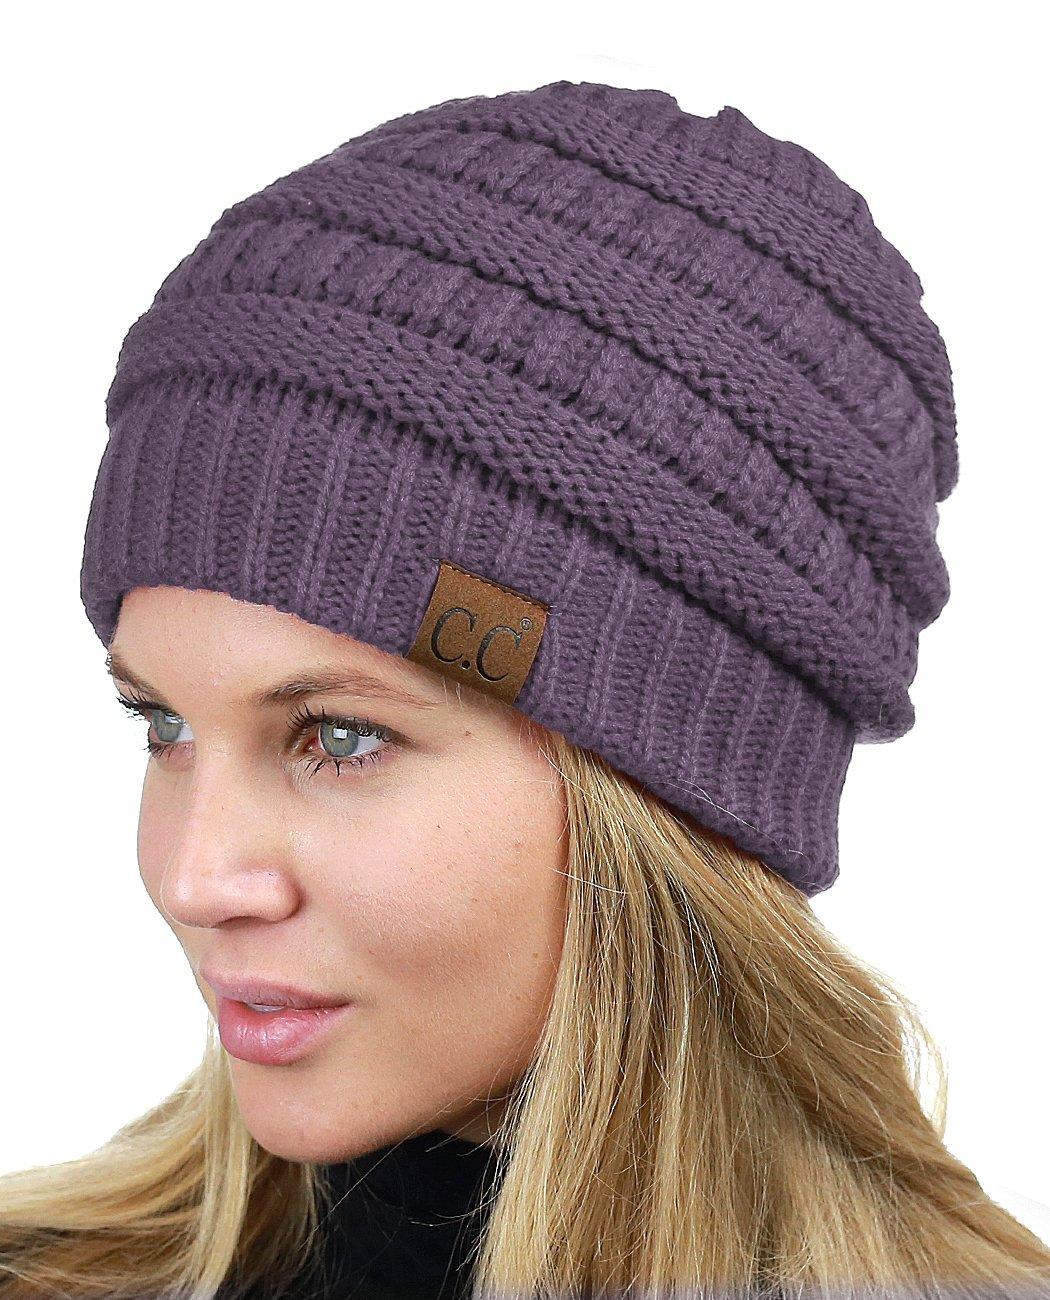 C.C Unisex Chunky Soft Stretch Cable Knit Warm Fuzzy Lined Skully Beanie Beige HAT25-BG